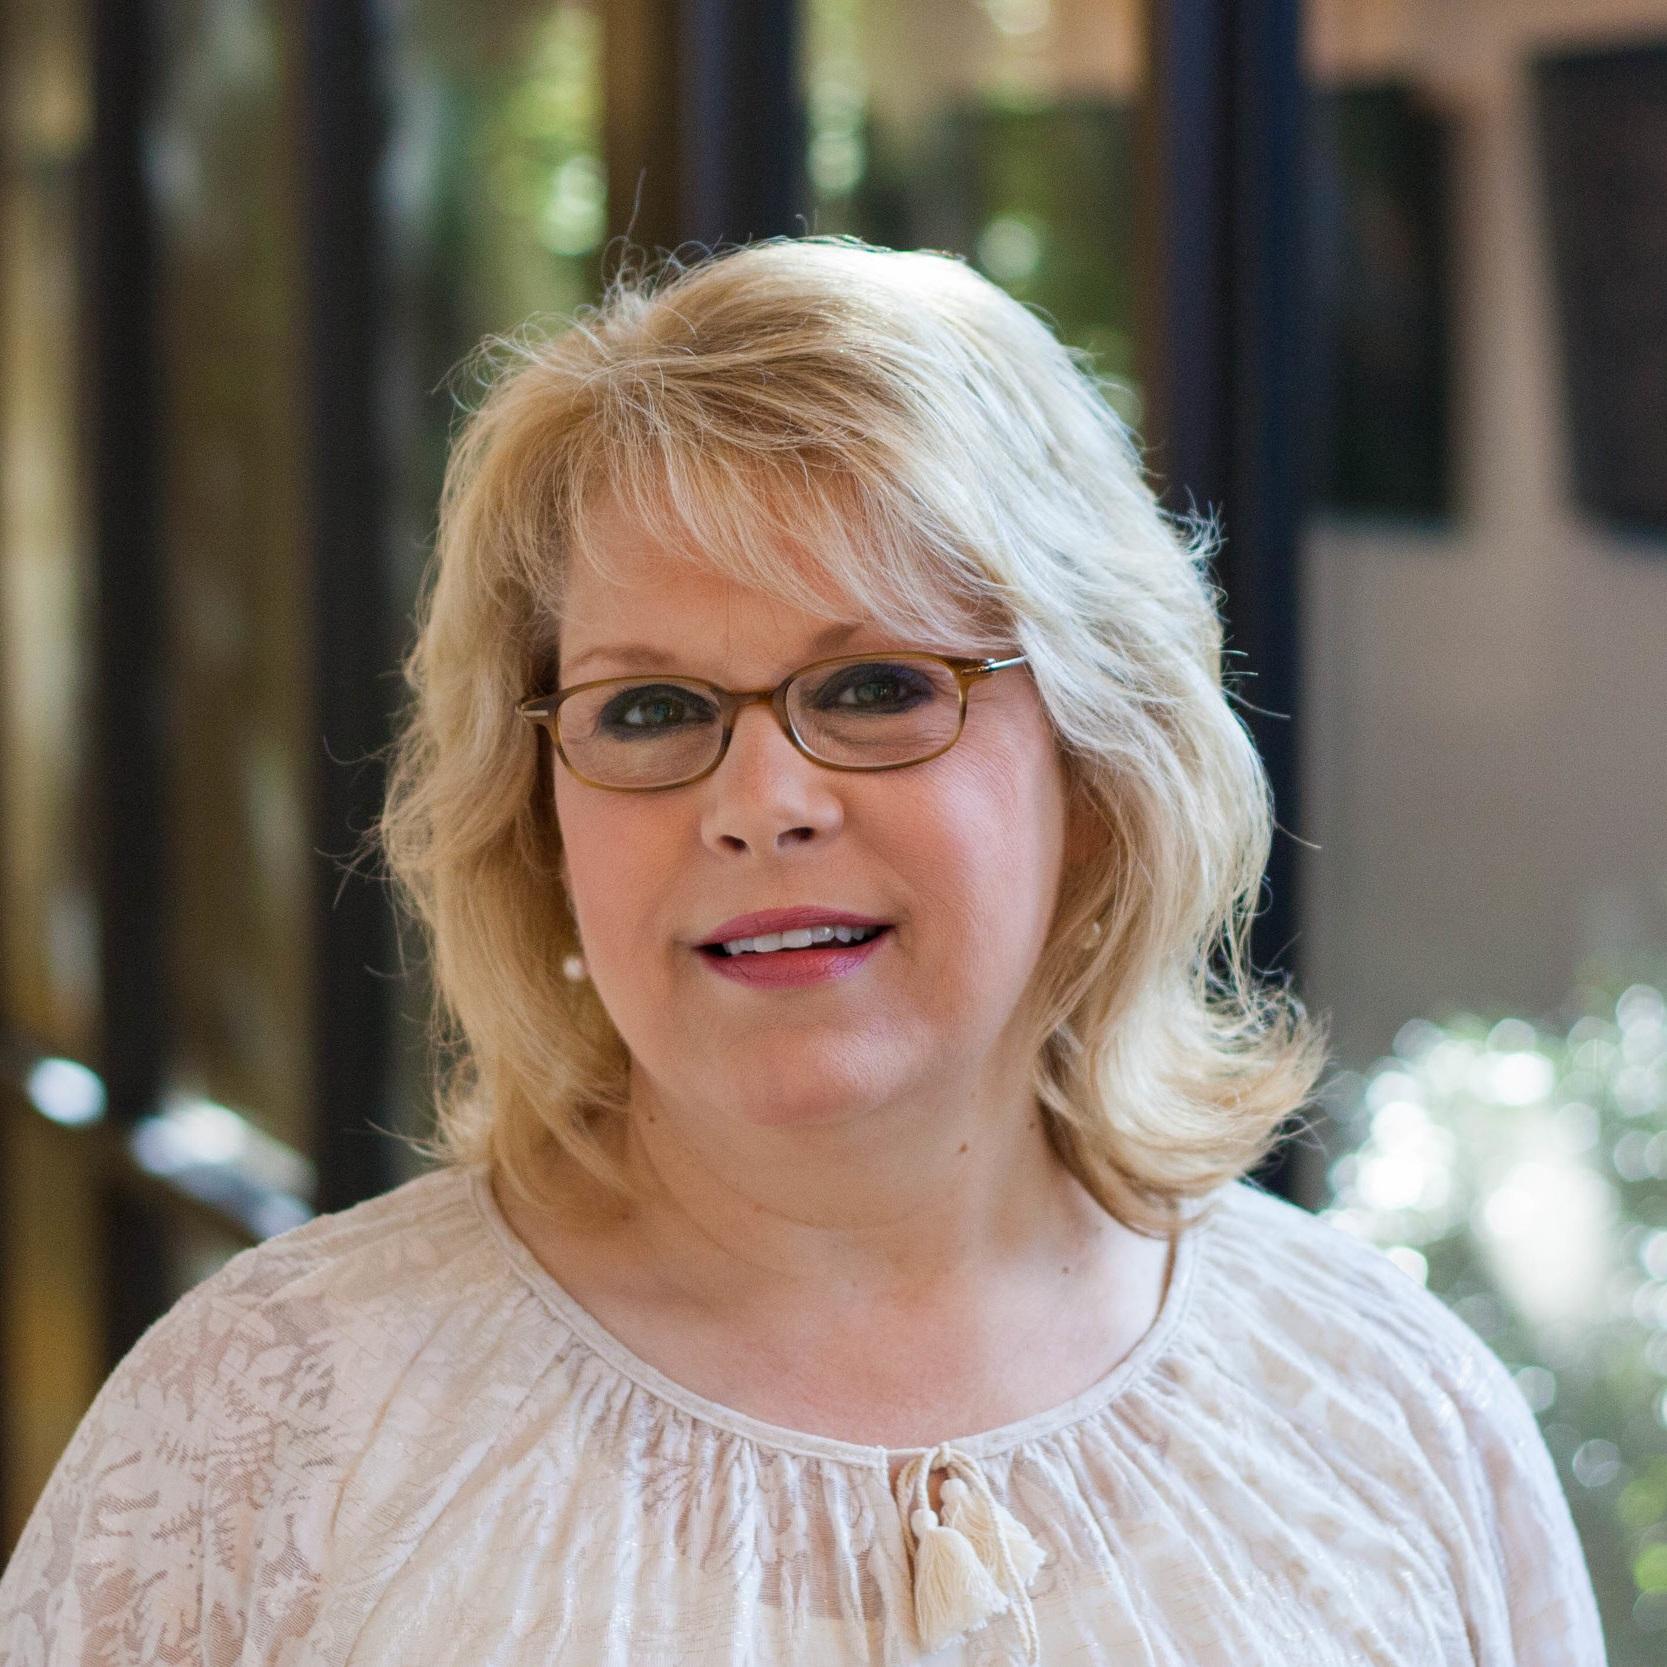 Debbie Wilbanks Cherry, AIA - Senior Associate Principal